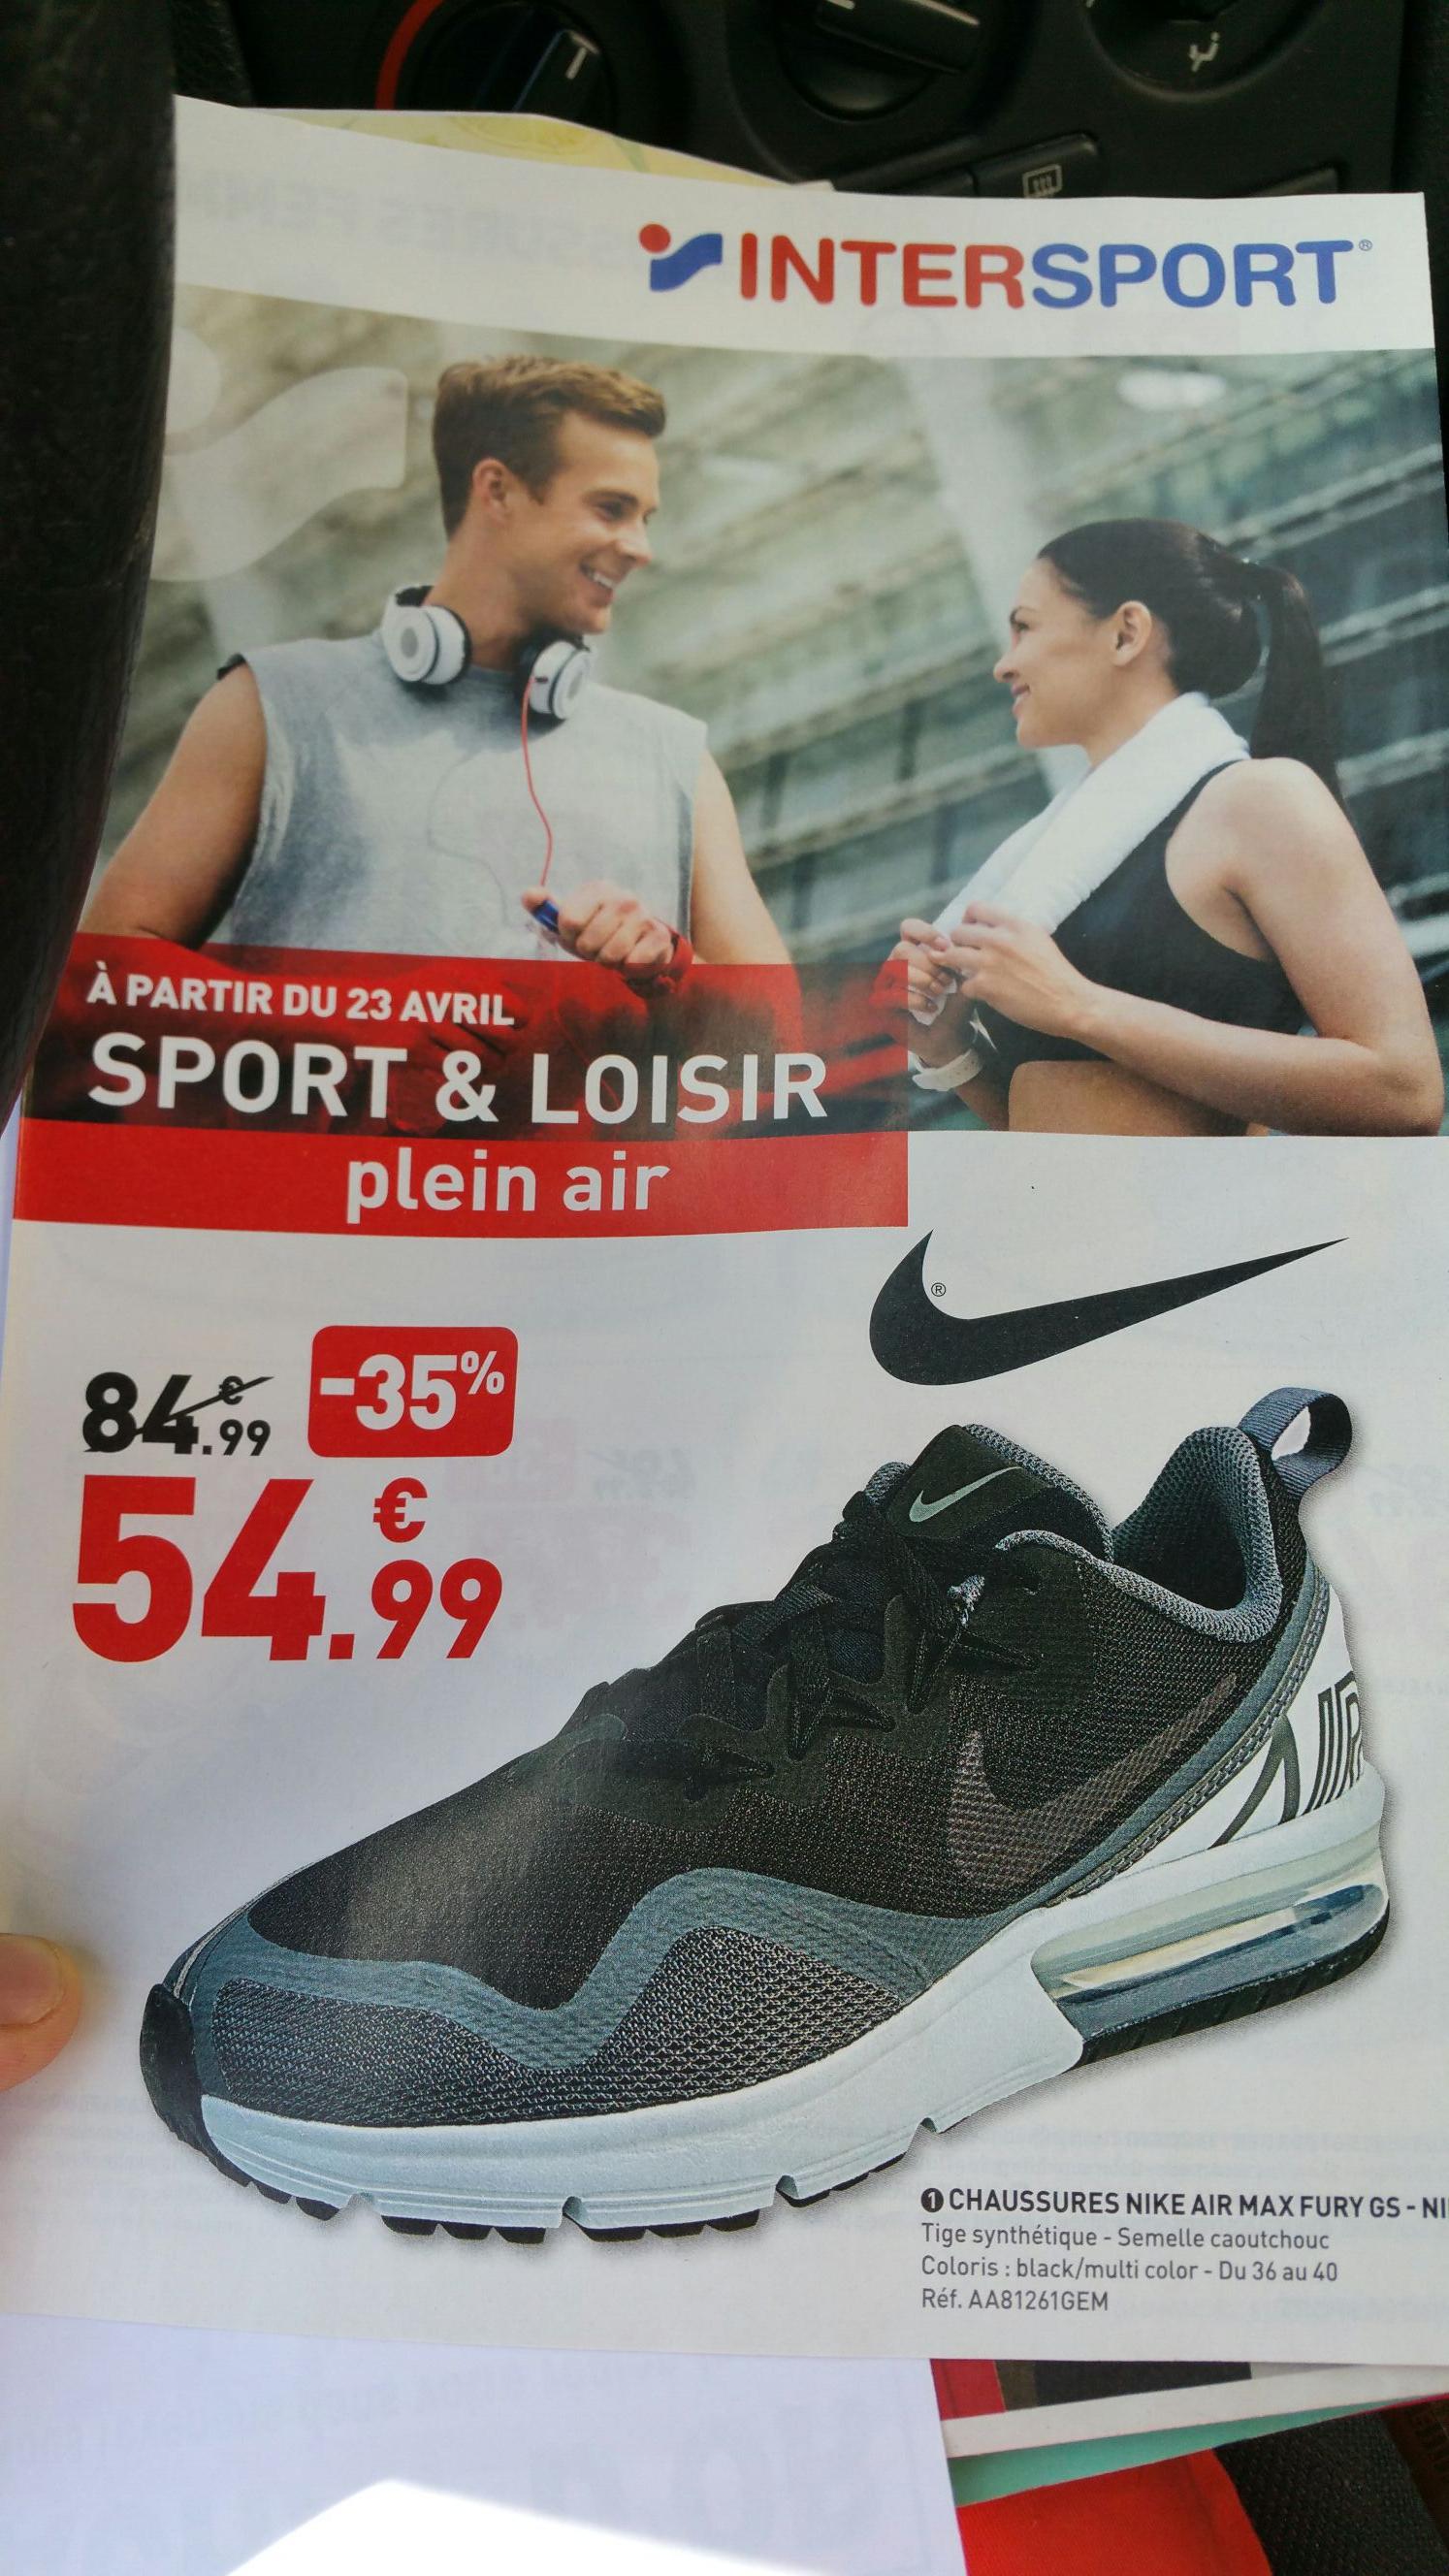 Chaussures enfant Nike air max fury GS - Bernay (27)